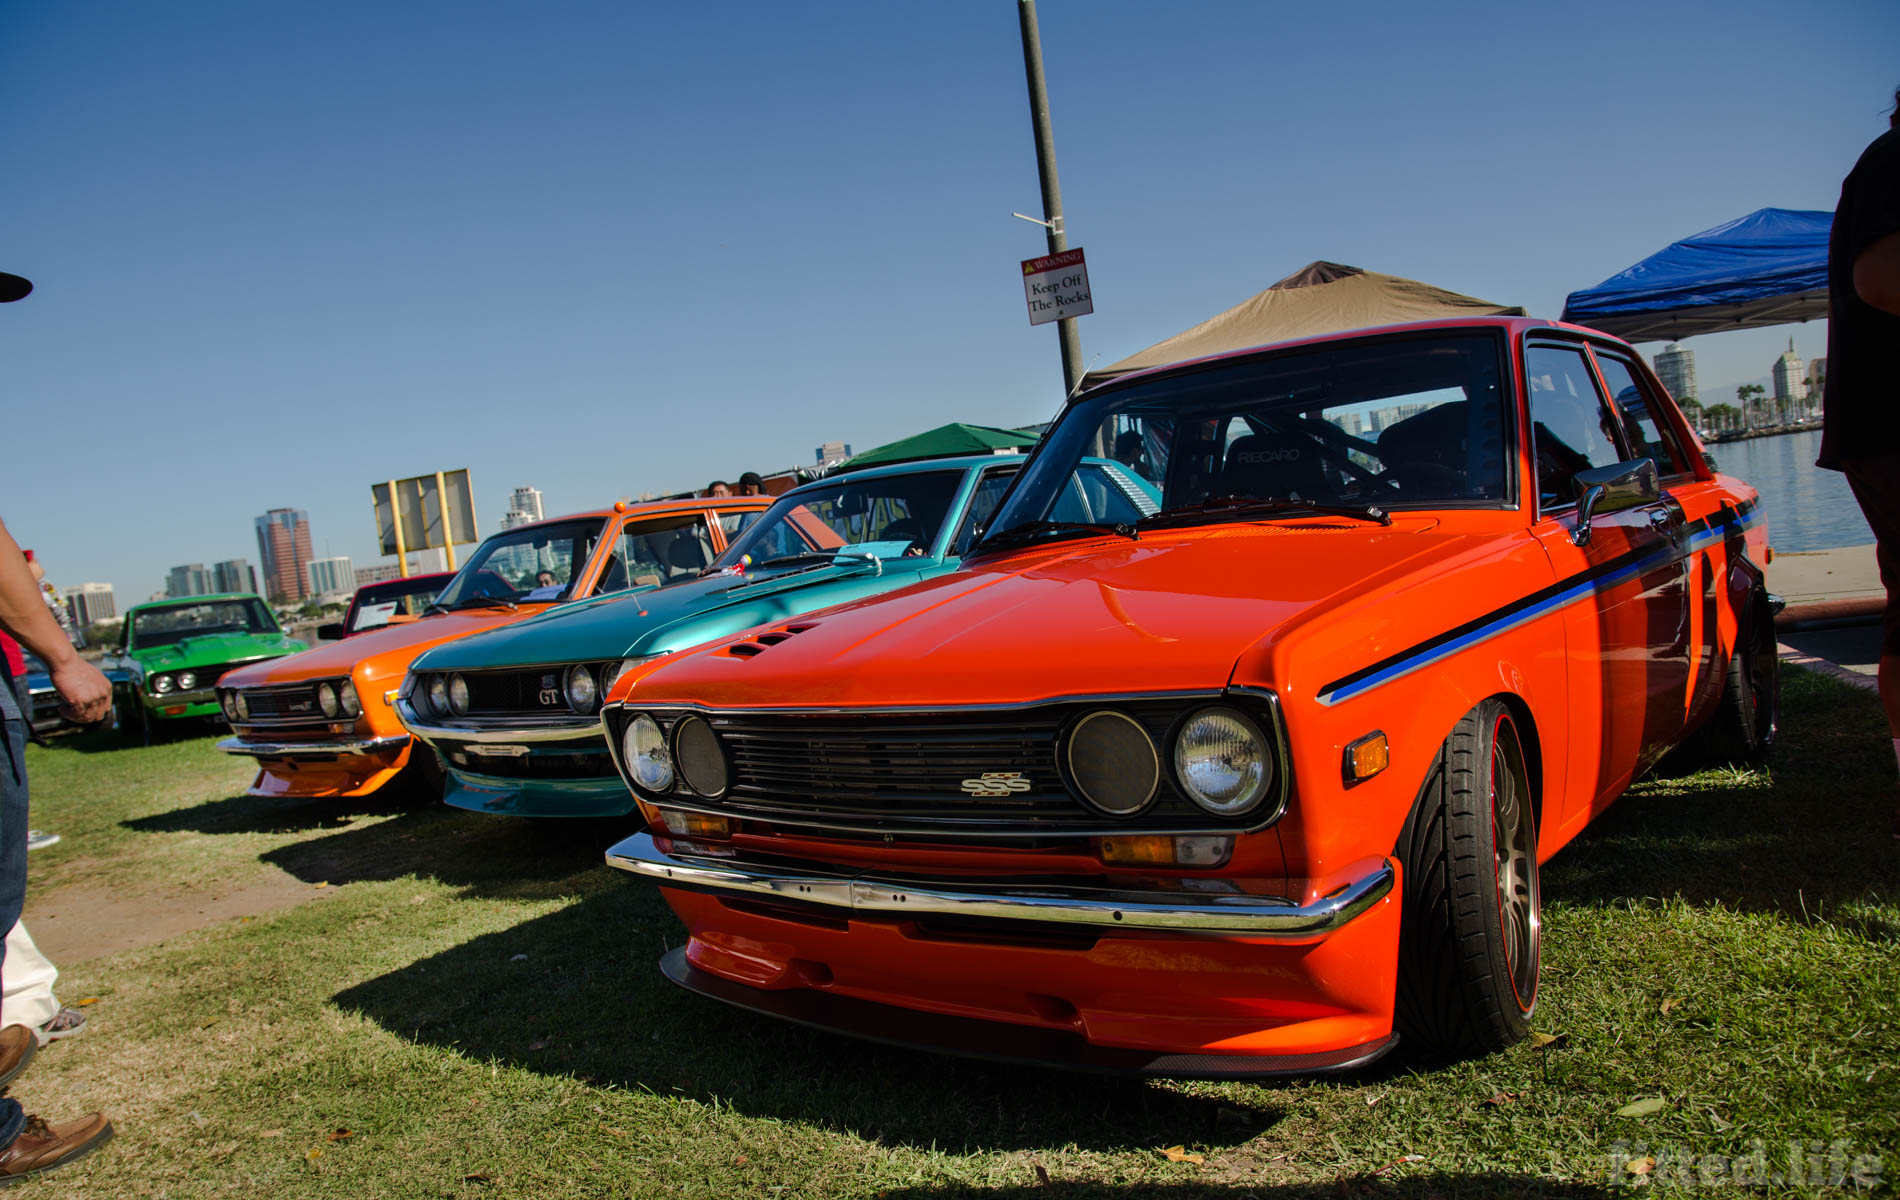 chasing-classics-at-jccs-2013-fittedlife3.jpg